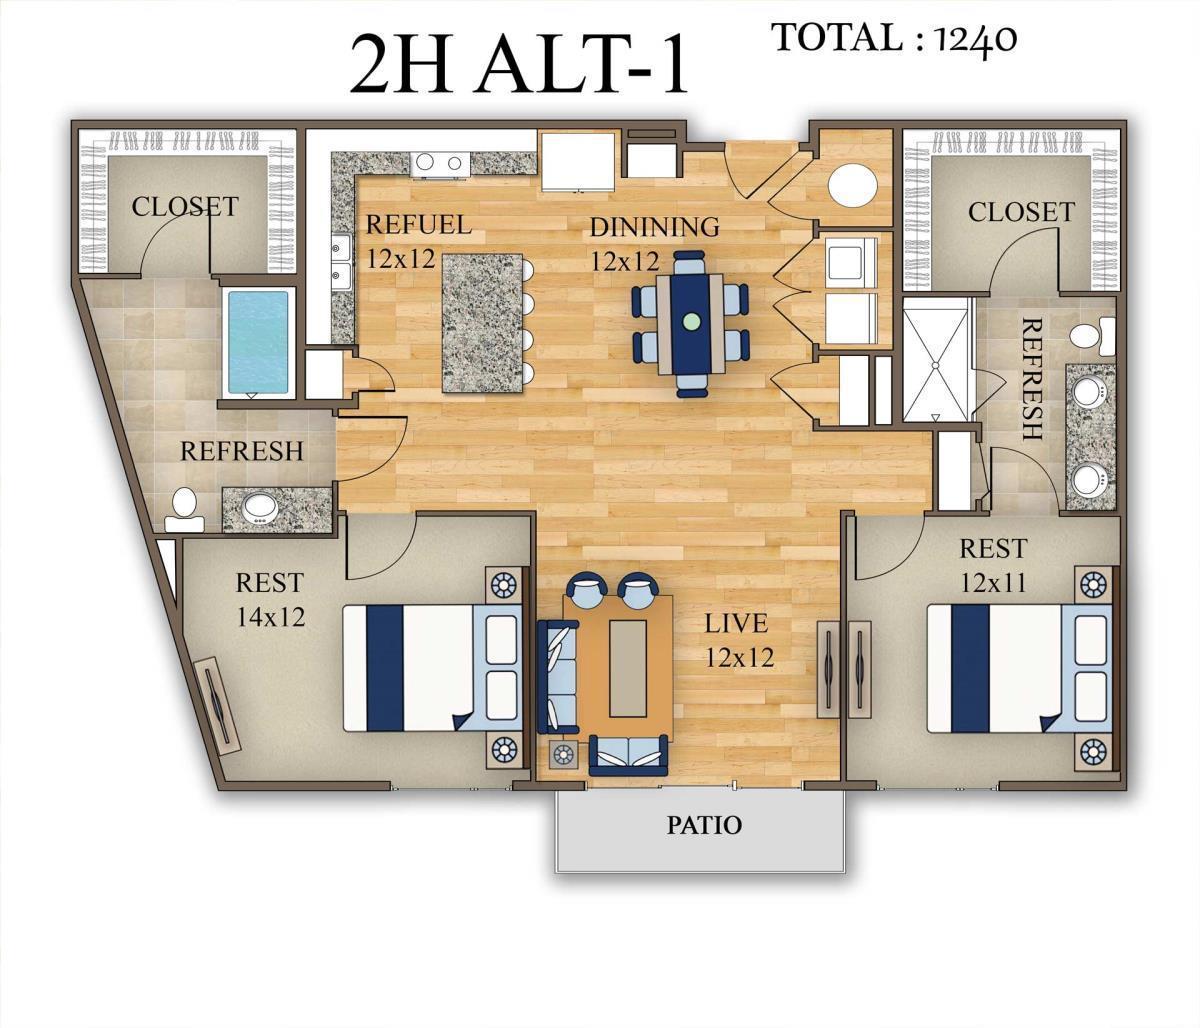 1,240 sq. ft. 2H Alt 1 floor plan